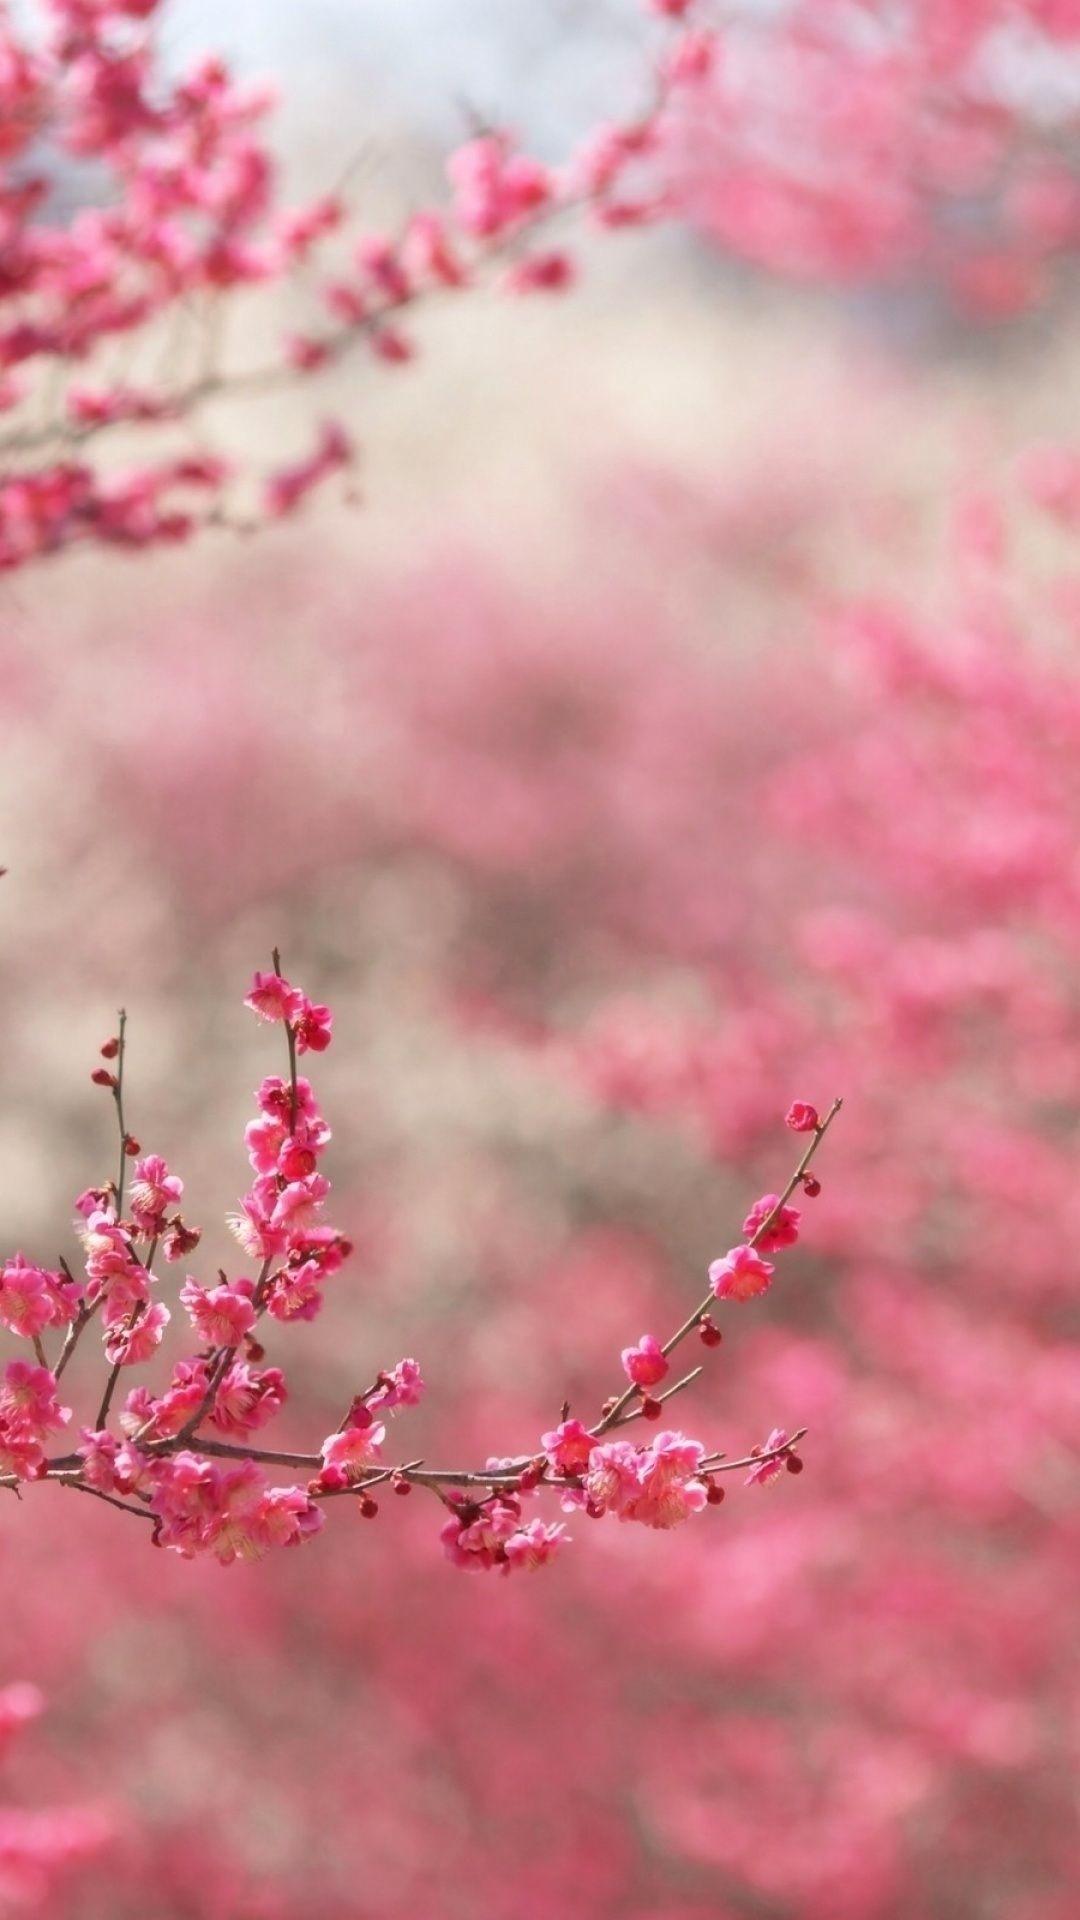 Cherry Blossom iphone 8 plus wallpaper